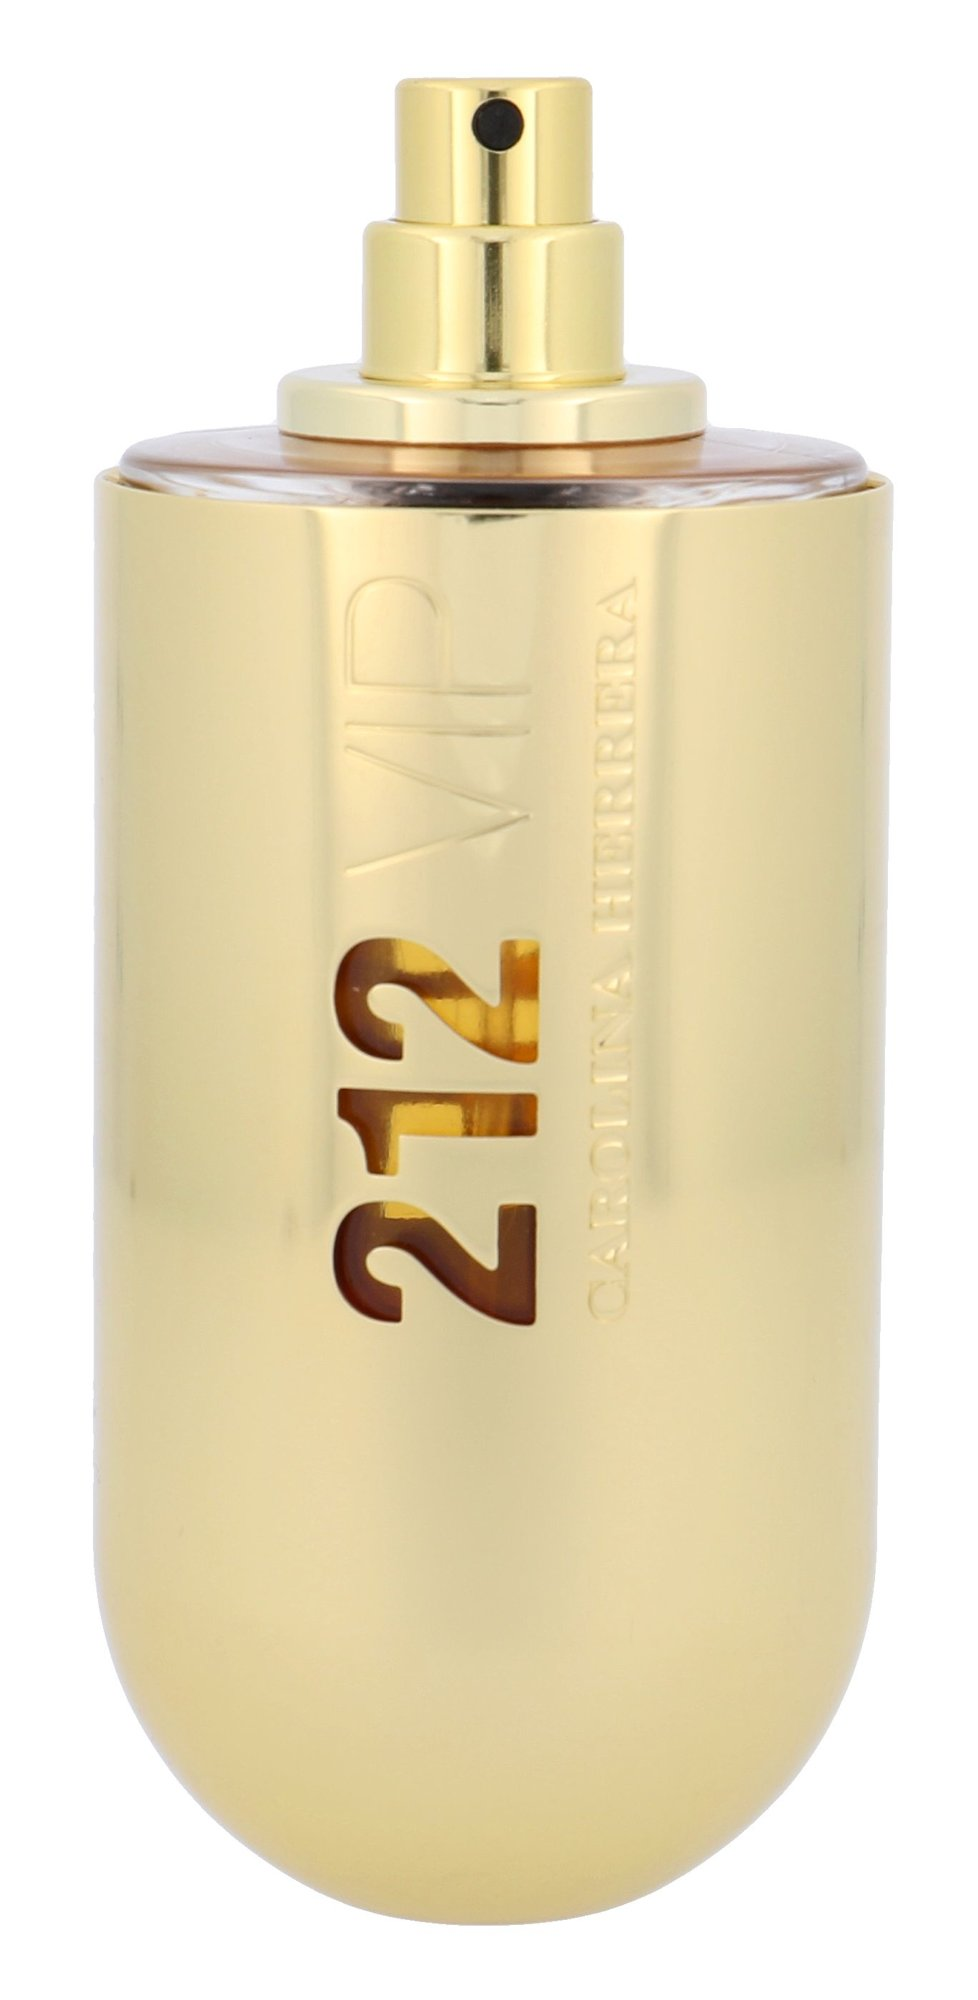 Carolina Herrera 212 VIP, Parfumovaná voda 80ml, Tester